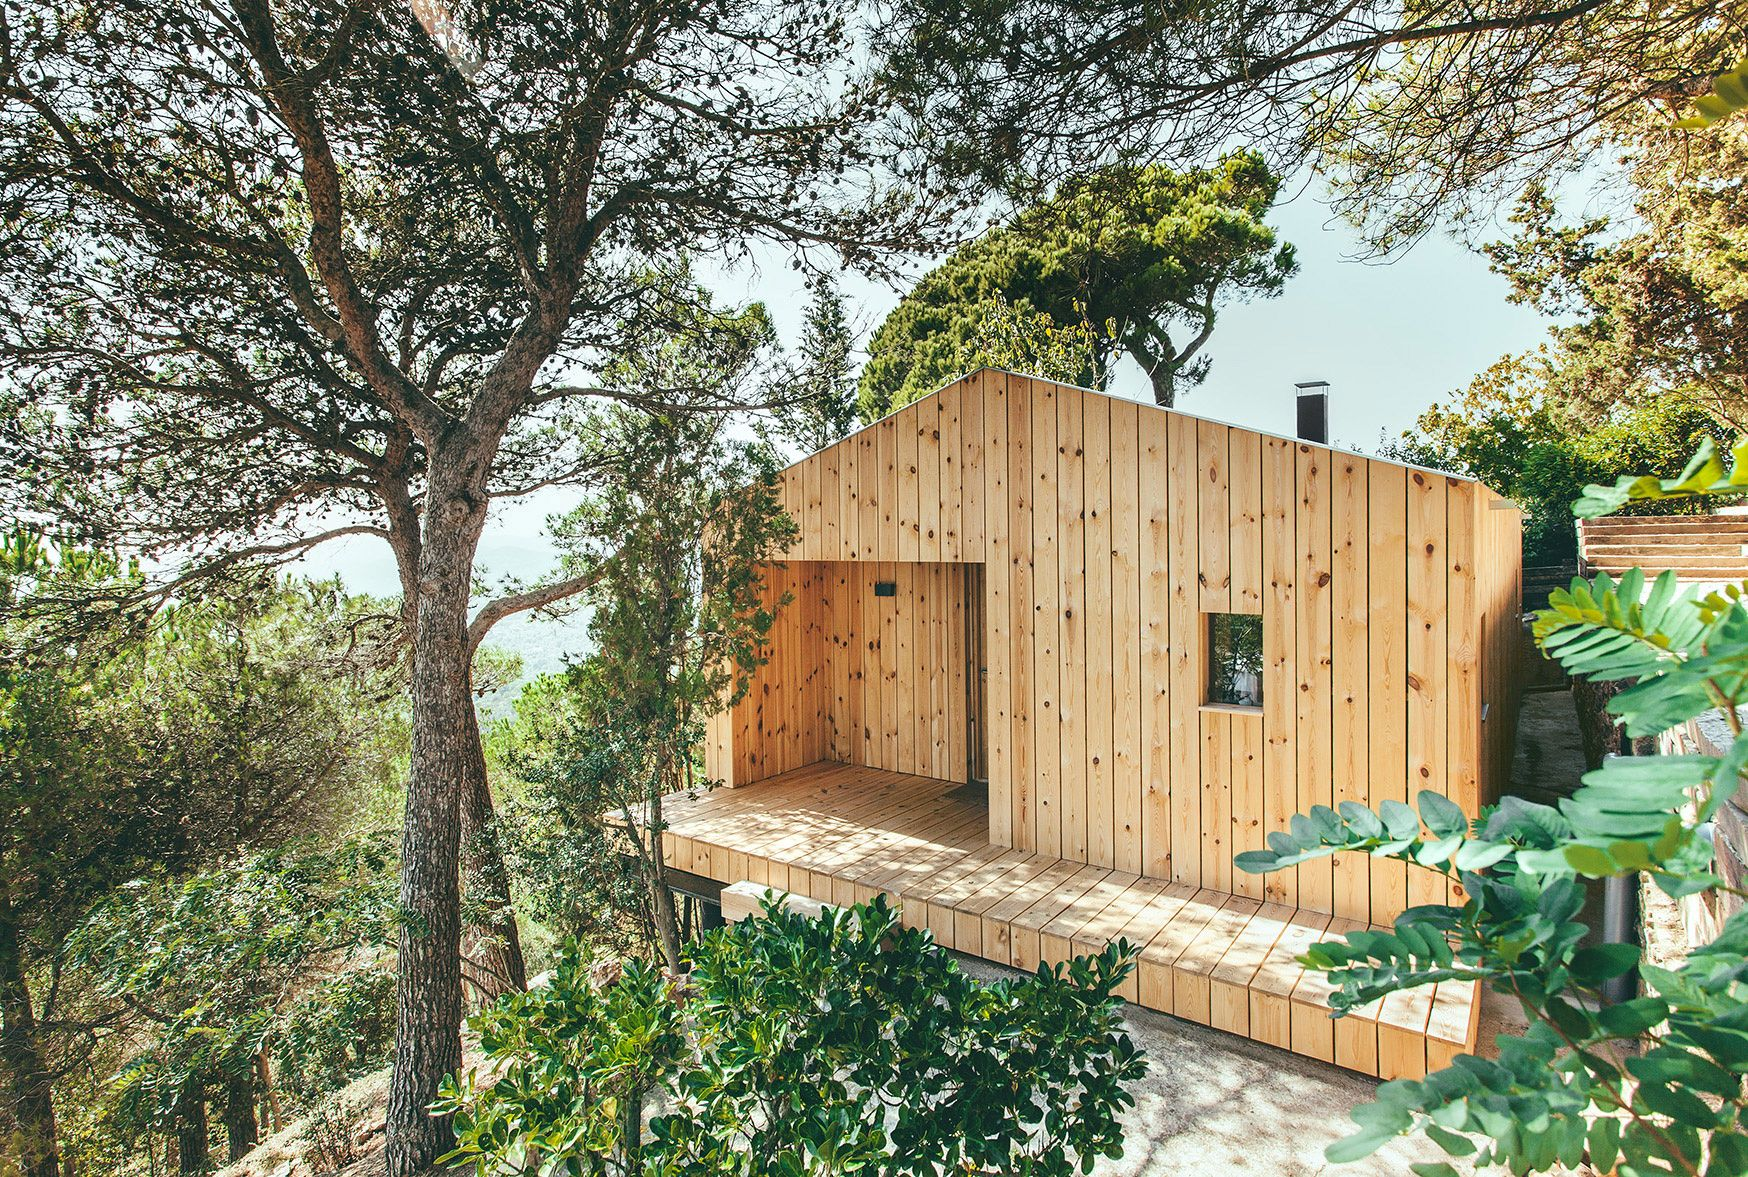 Home Tour: A Prefabricated Loft Among The Trees